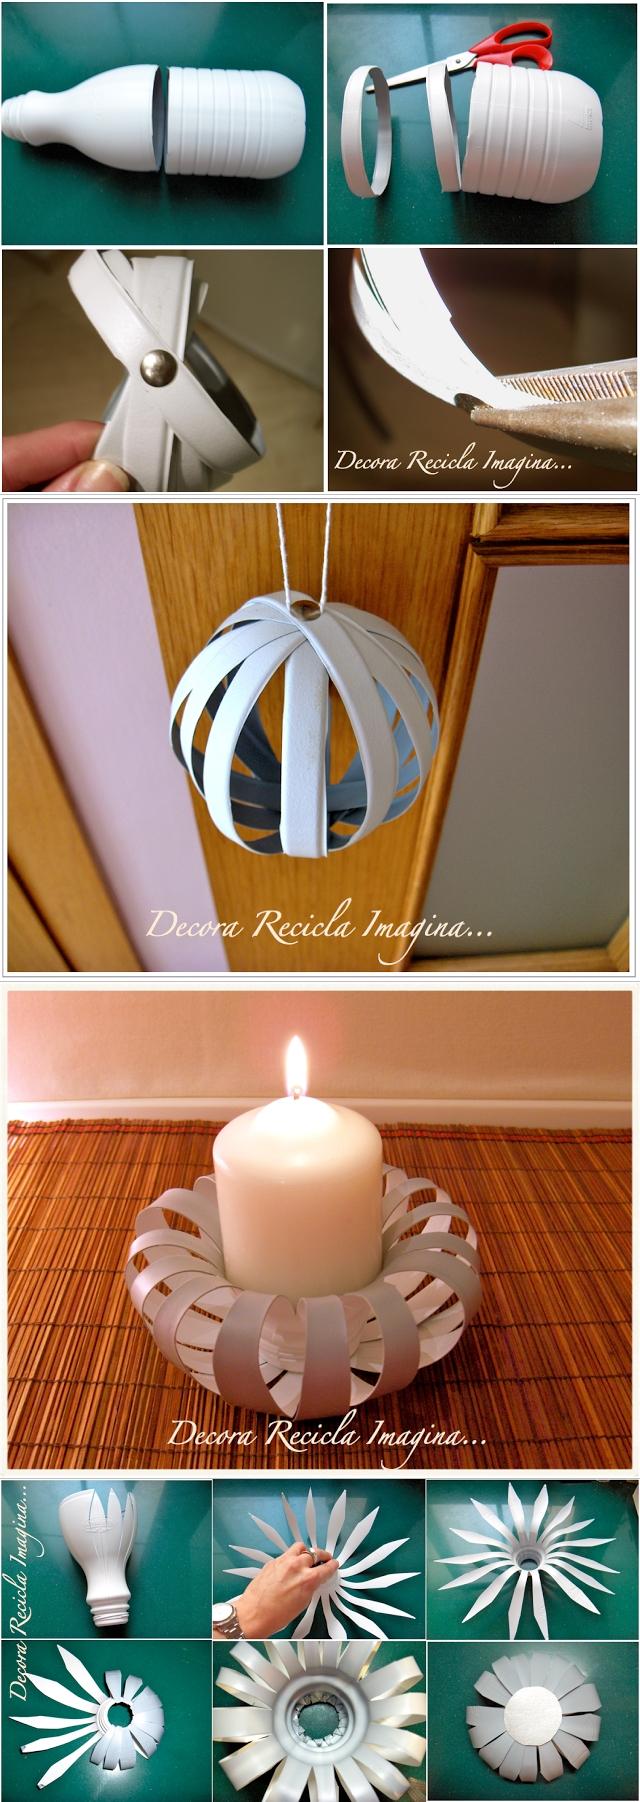 DIY Candle Holder from Plastic Bottle